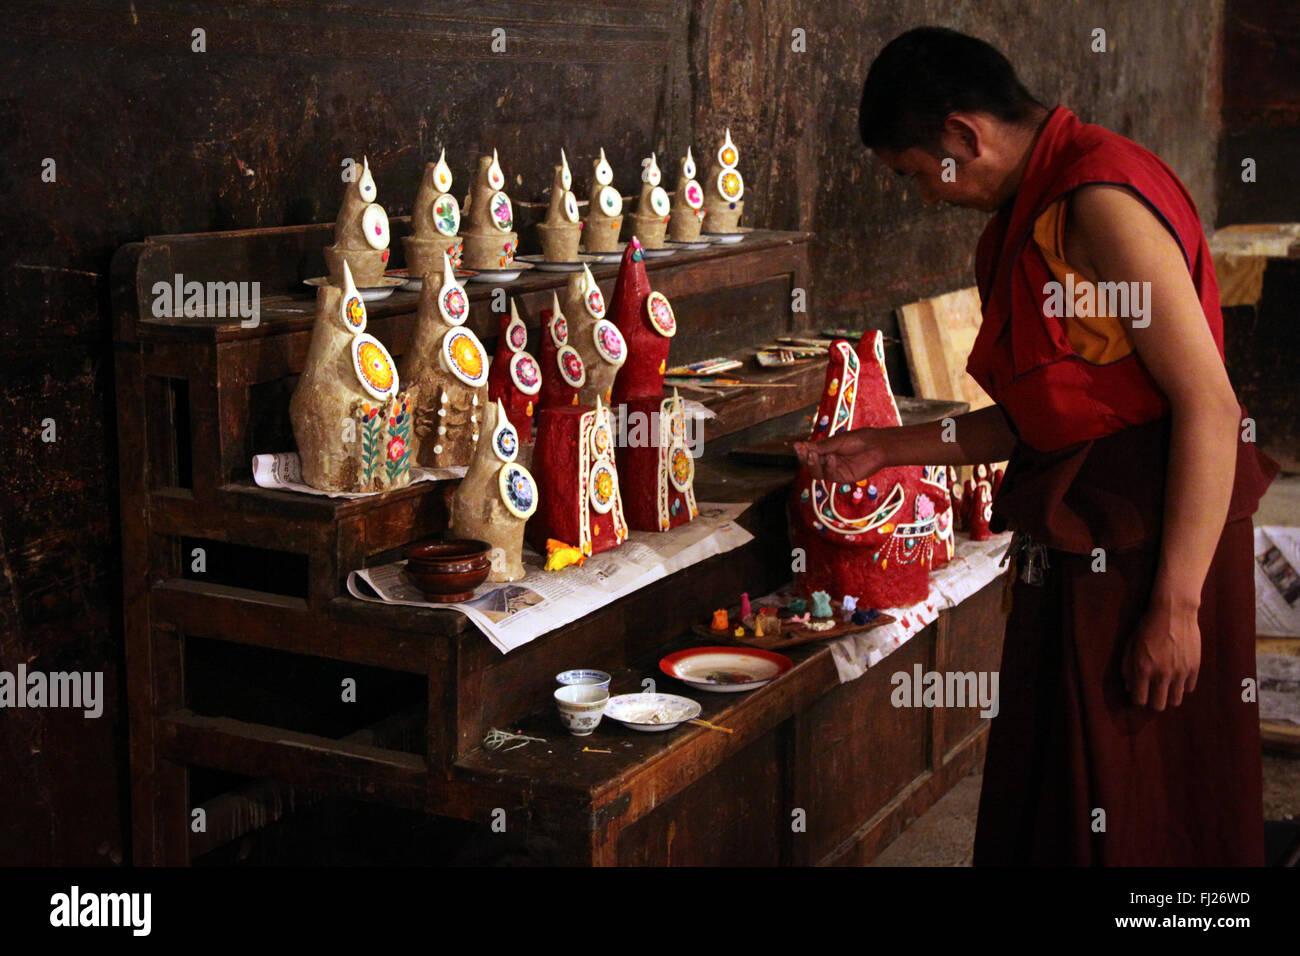 Monk making statues at Gyantse monastery, Tibet - Stock Image